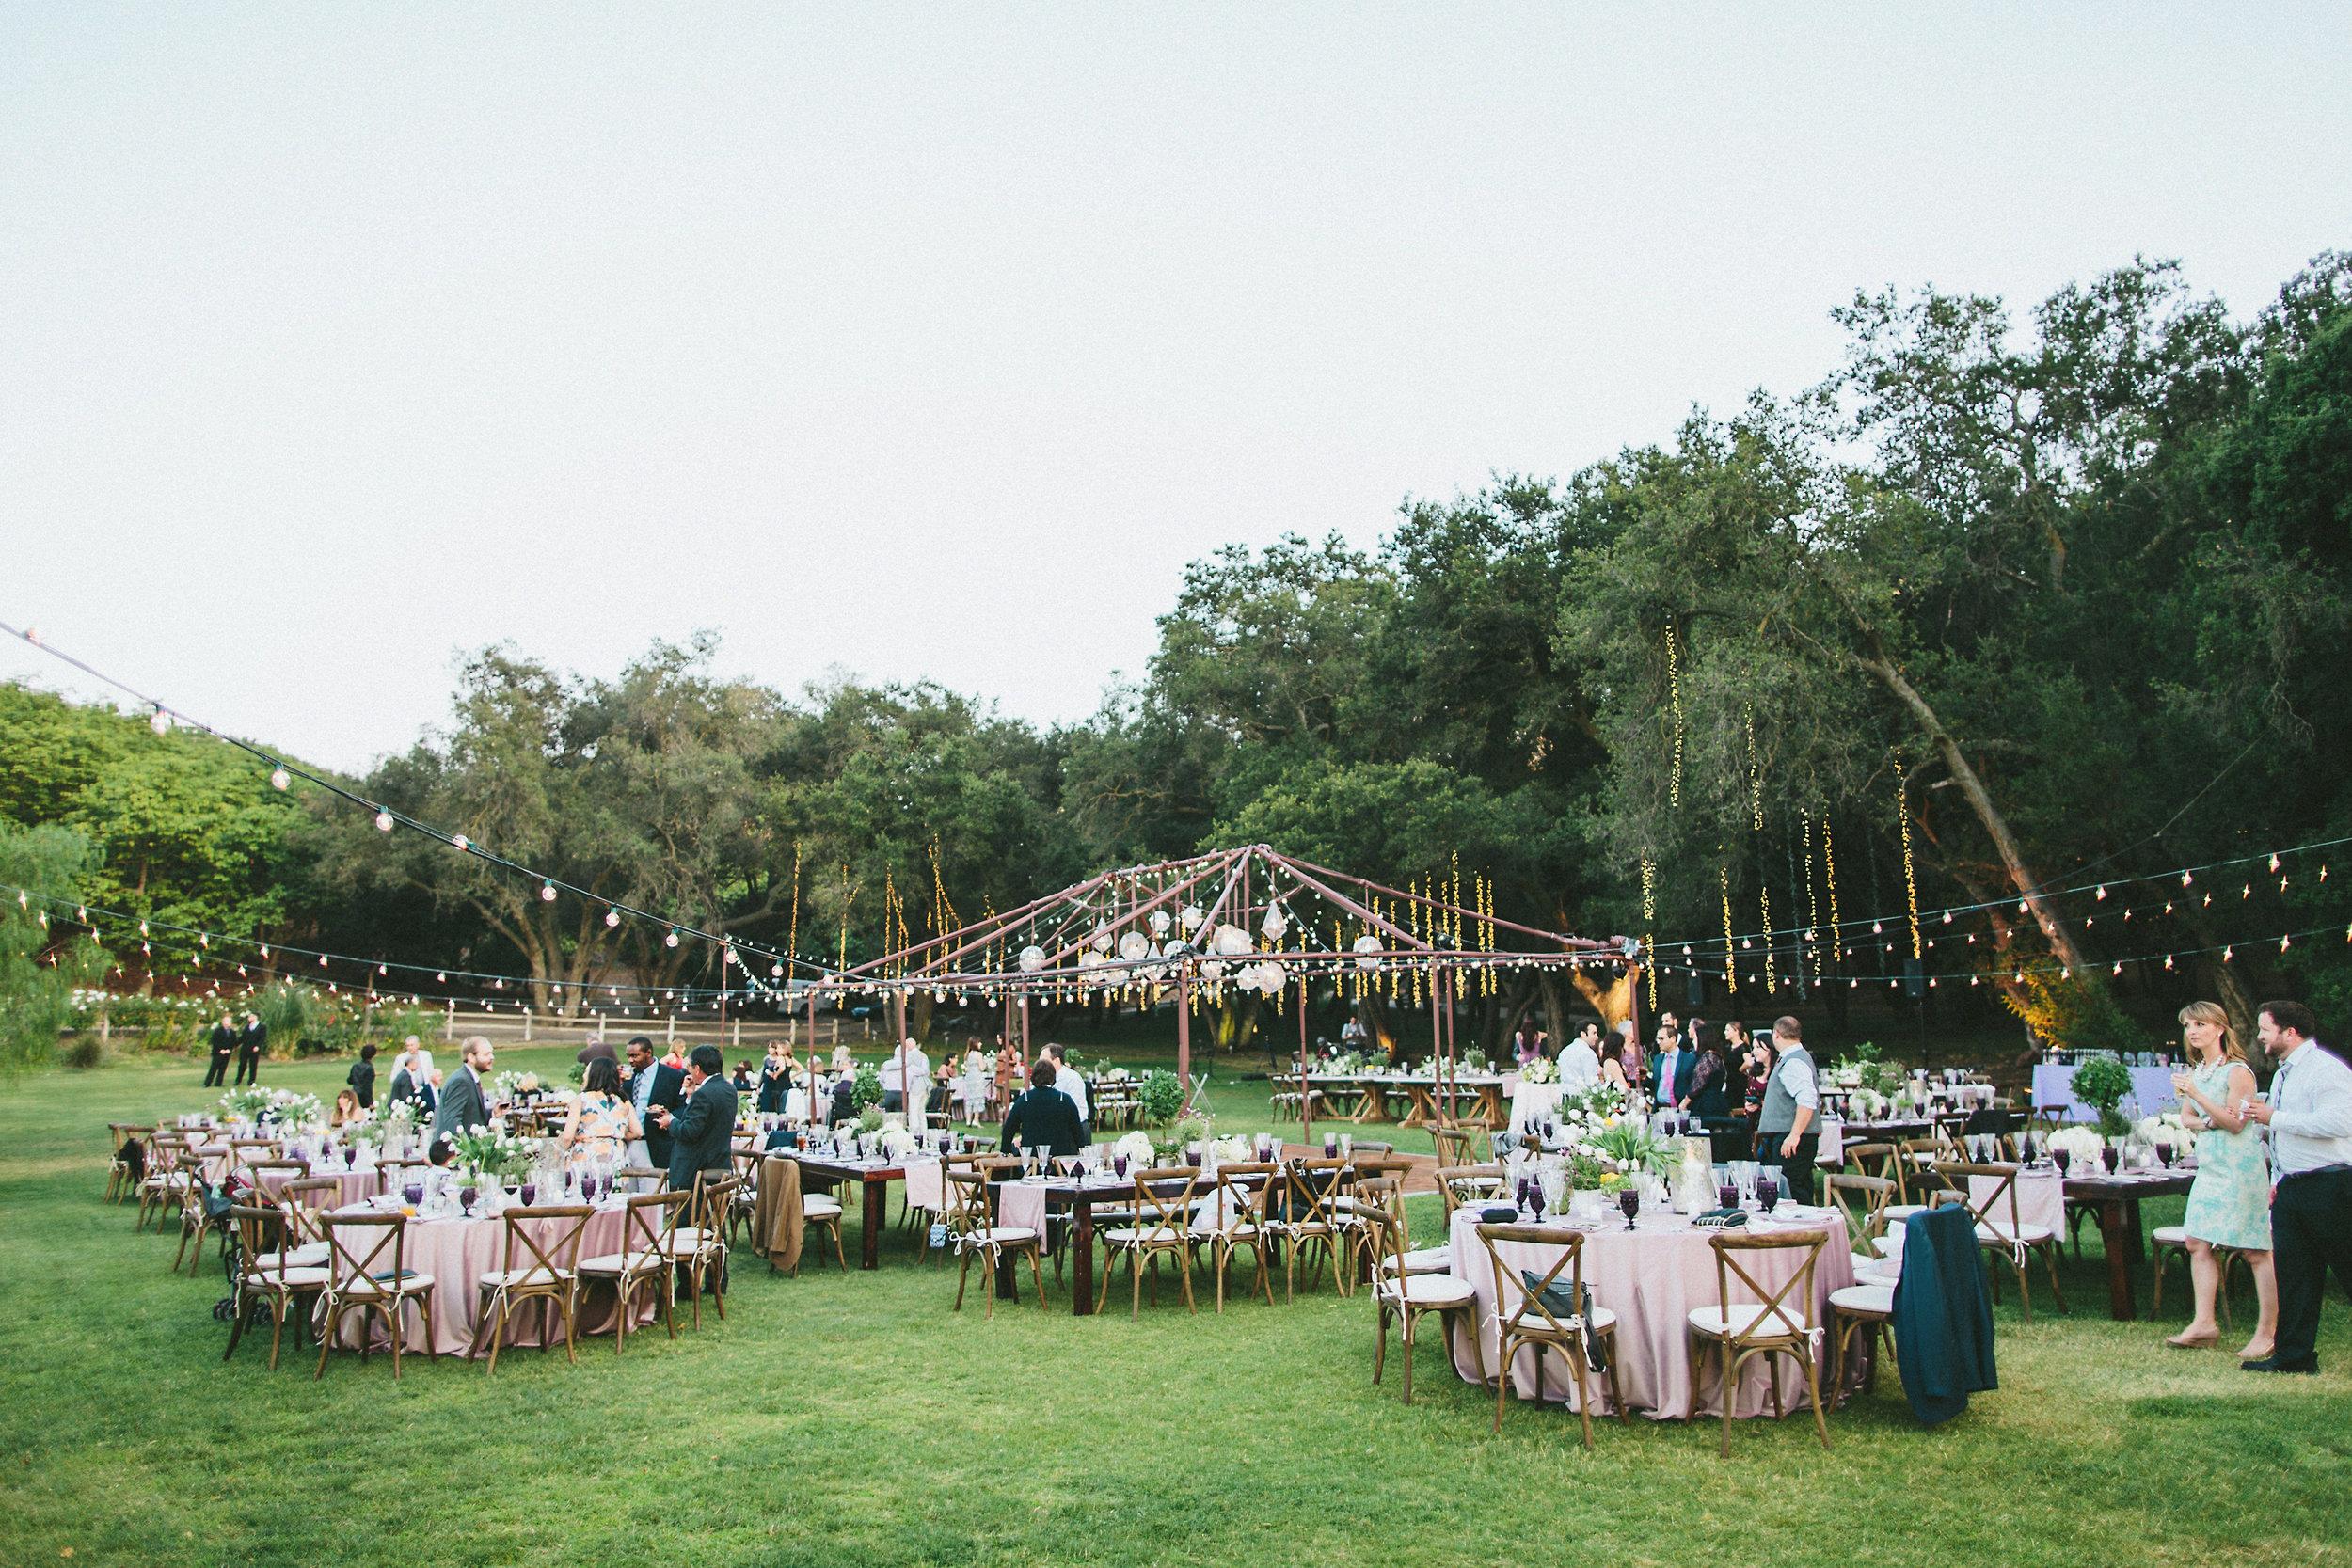 carmona_wedding_0845.jpg